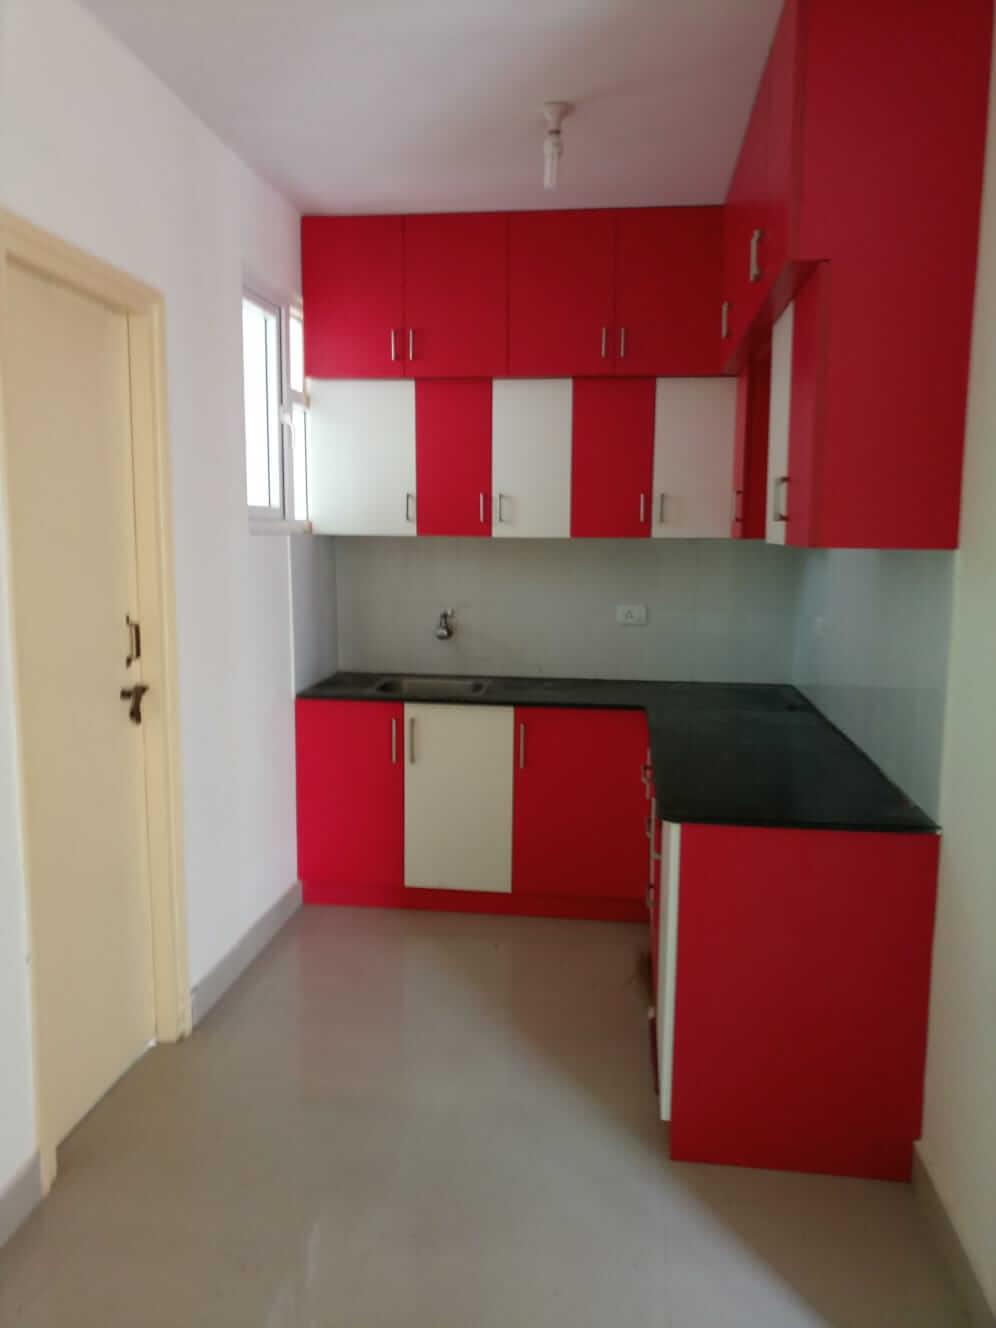 3 BHK Apartment / Flat for Sale 950 Sq. Feet at Bangalore, Anekal